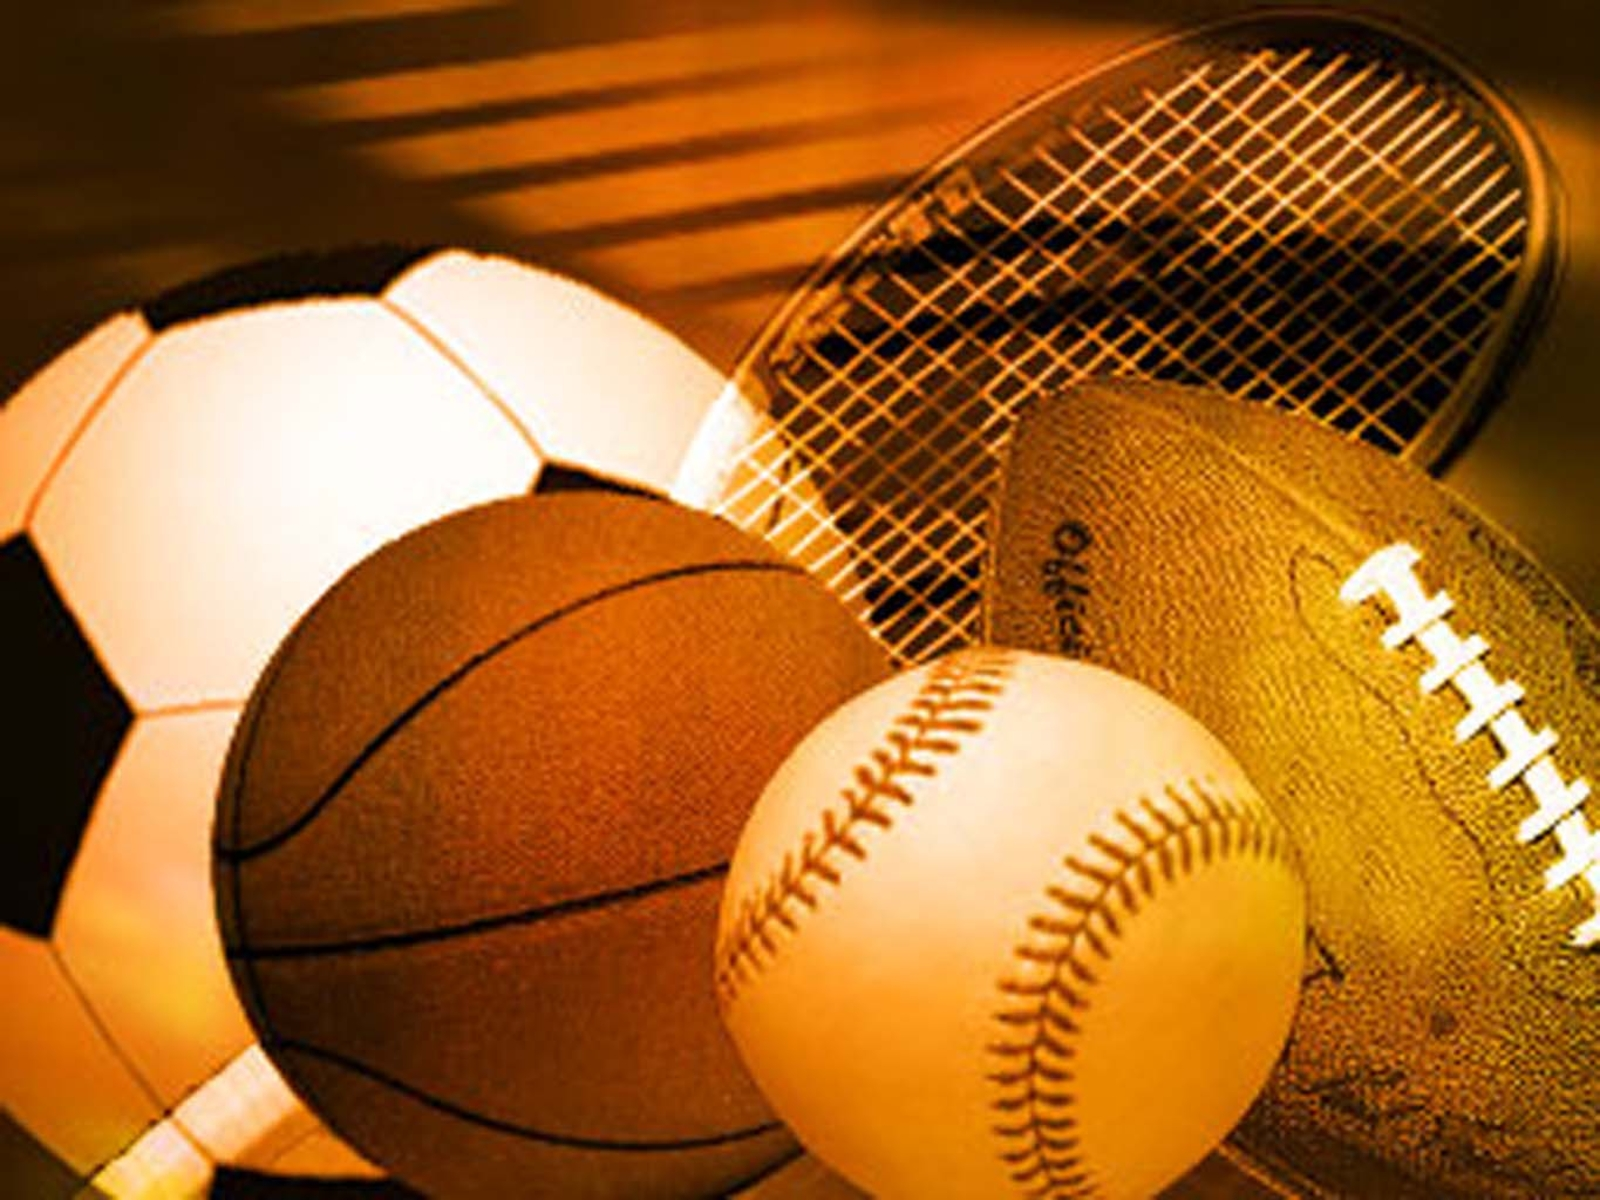 Sports Ball Desktop Background